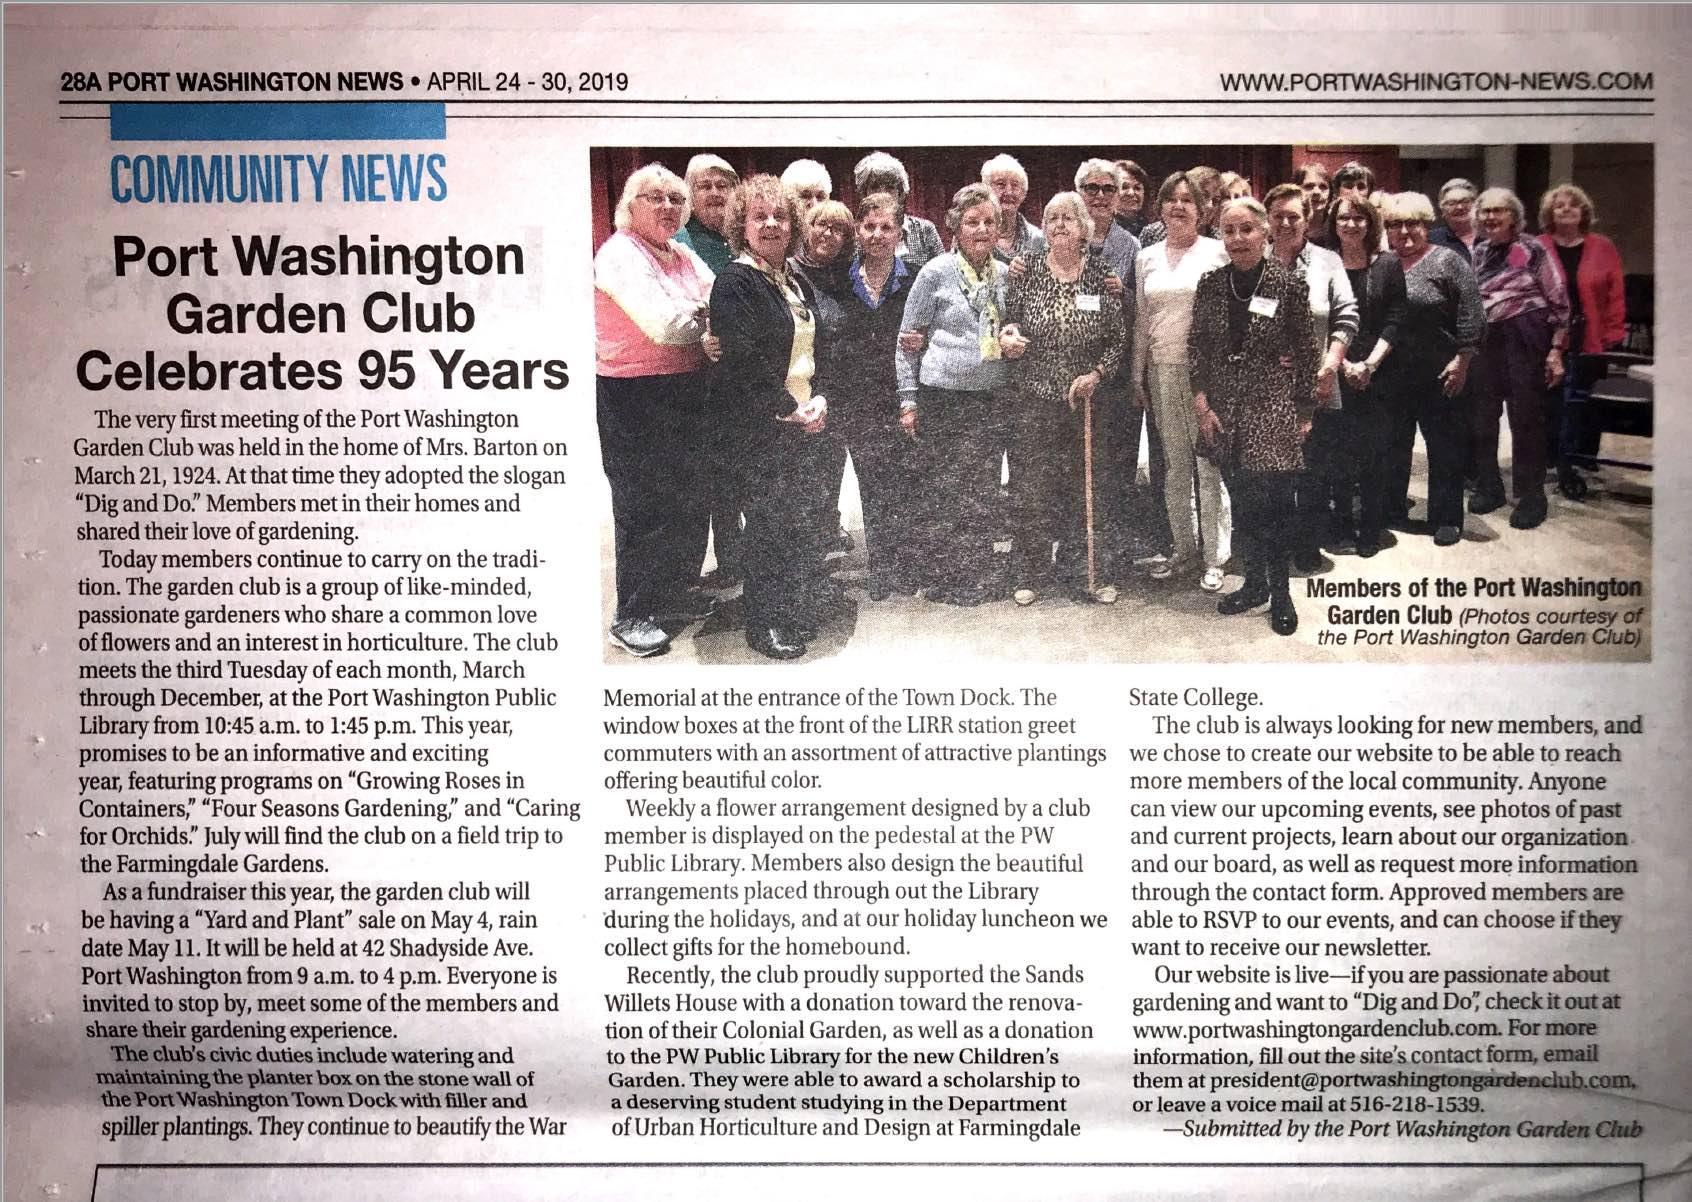 Port Washington Garden Club Celebrates 95 Years